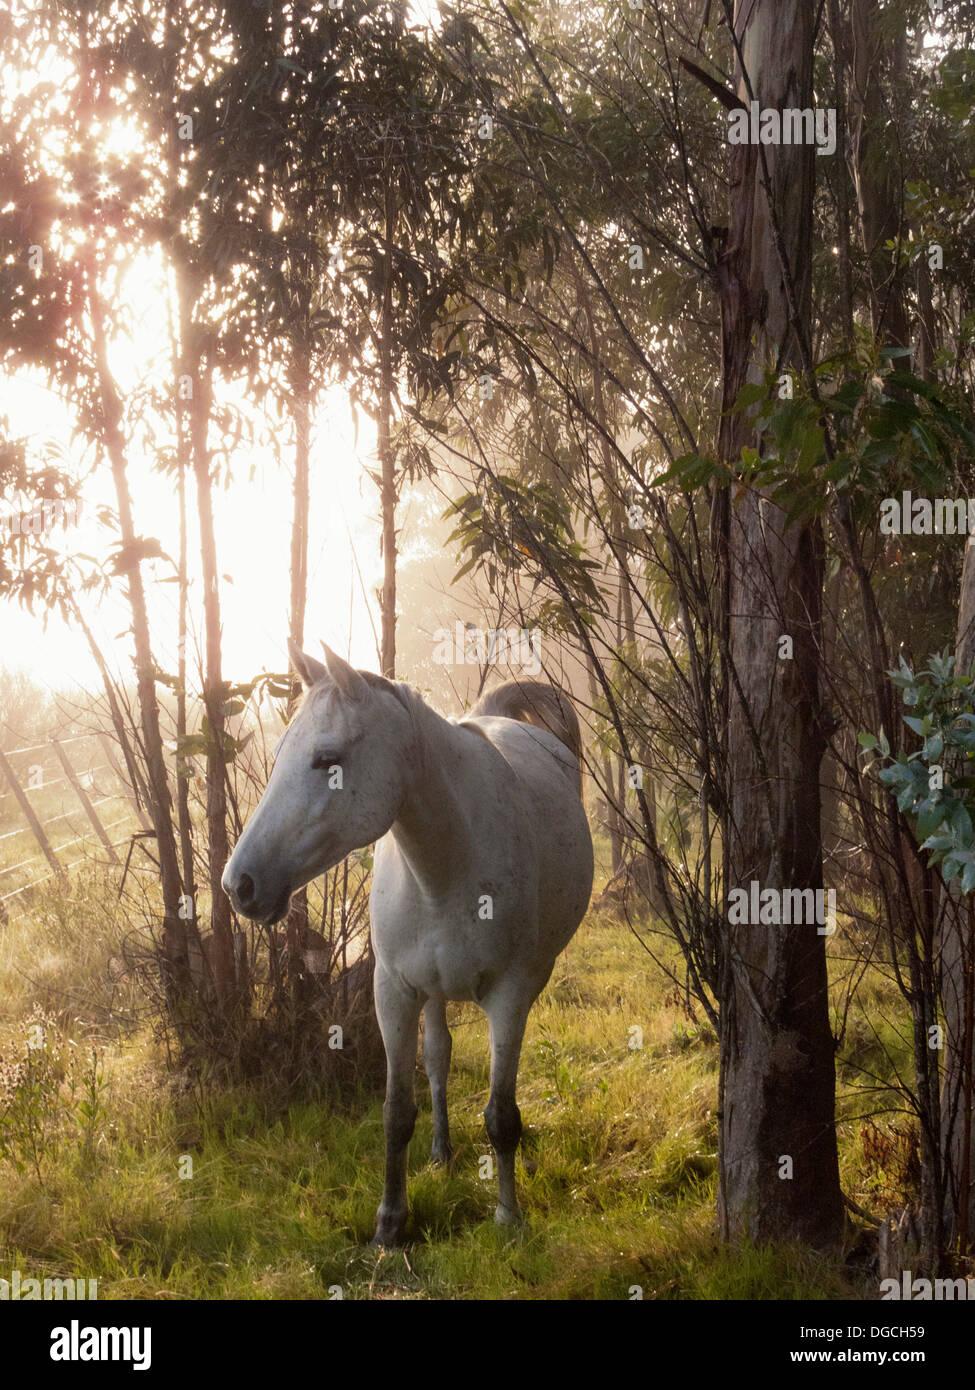 Criollo horse in forest, Uruguay - Stock Image